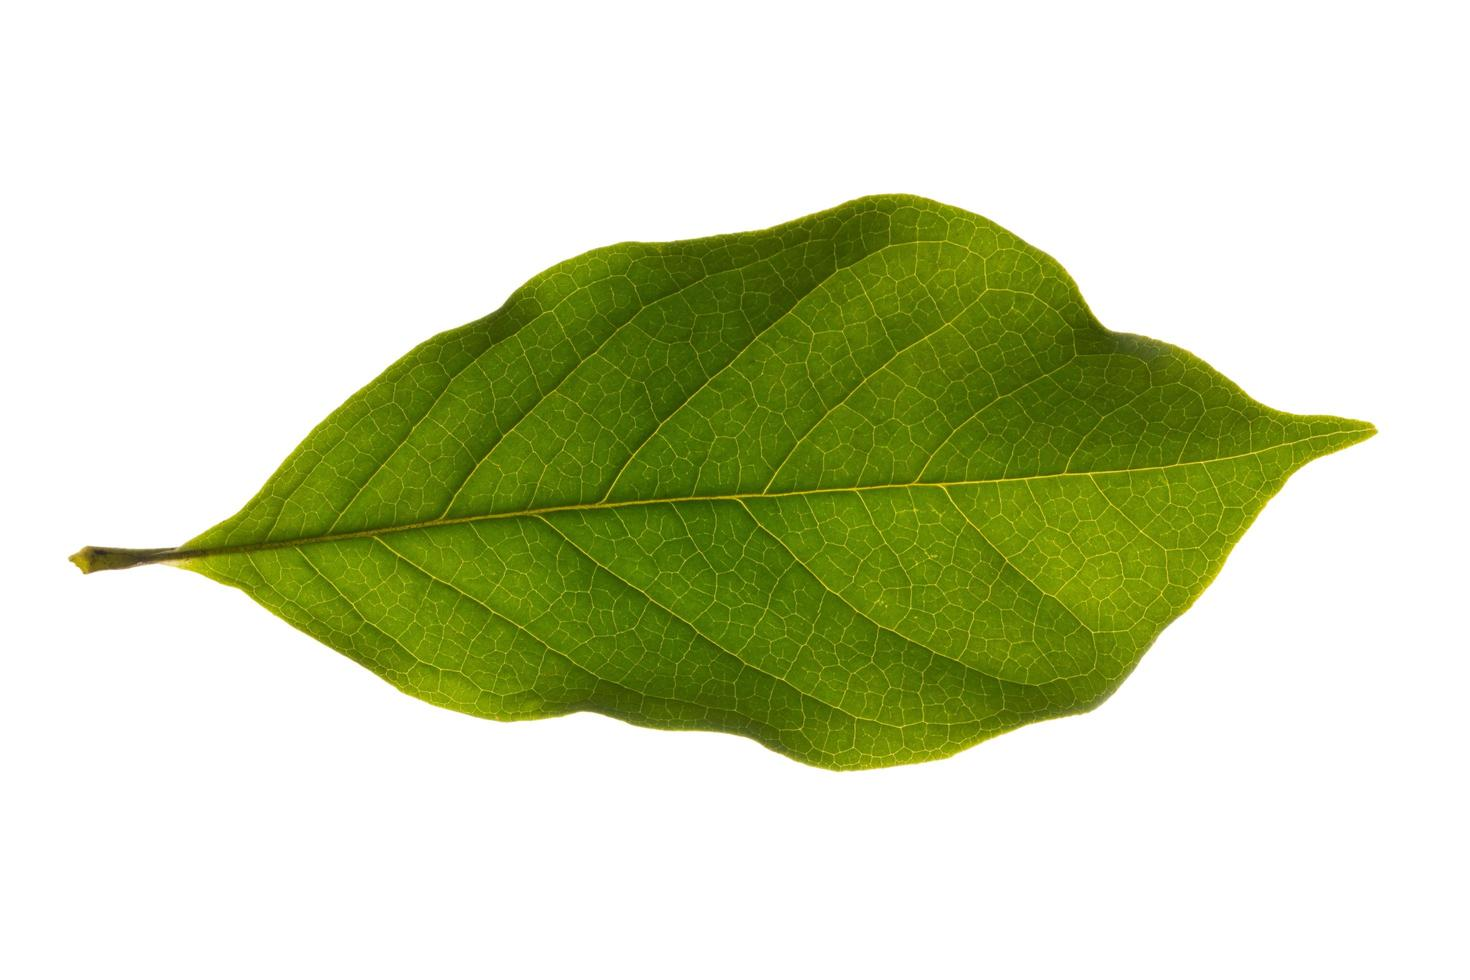 foglia verde su sfondo bianco foto